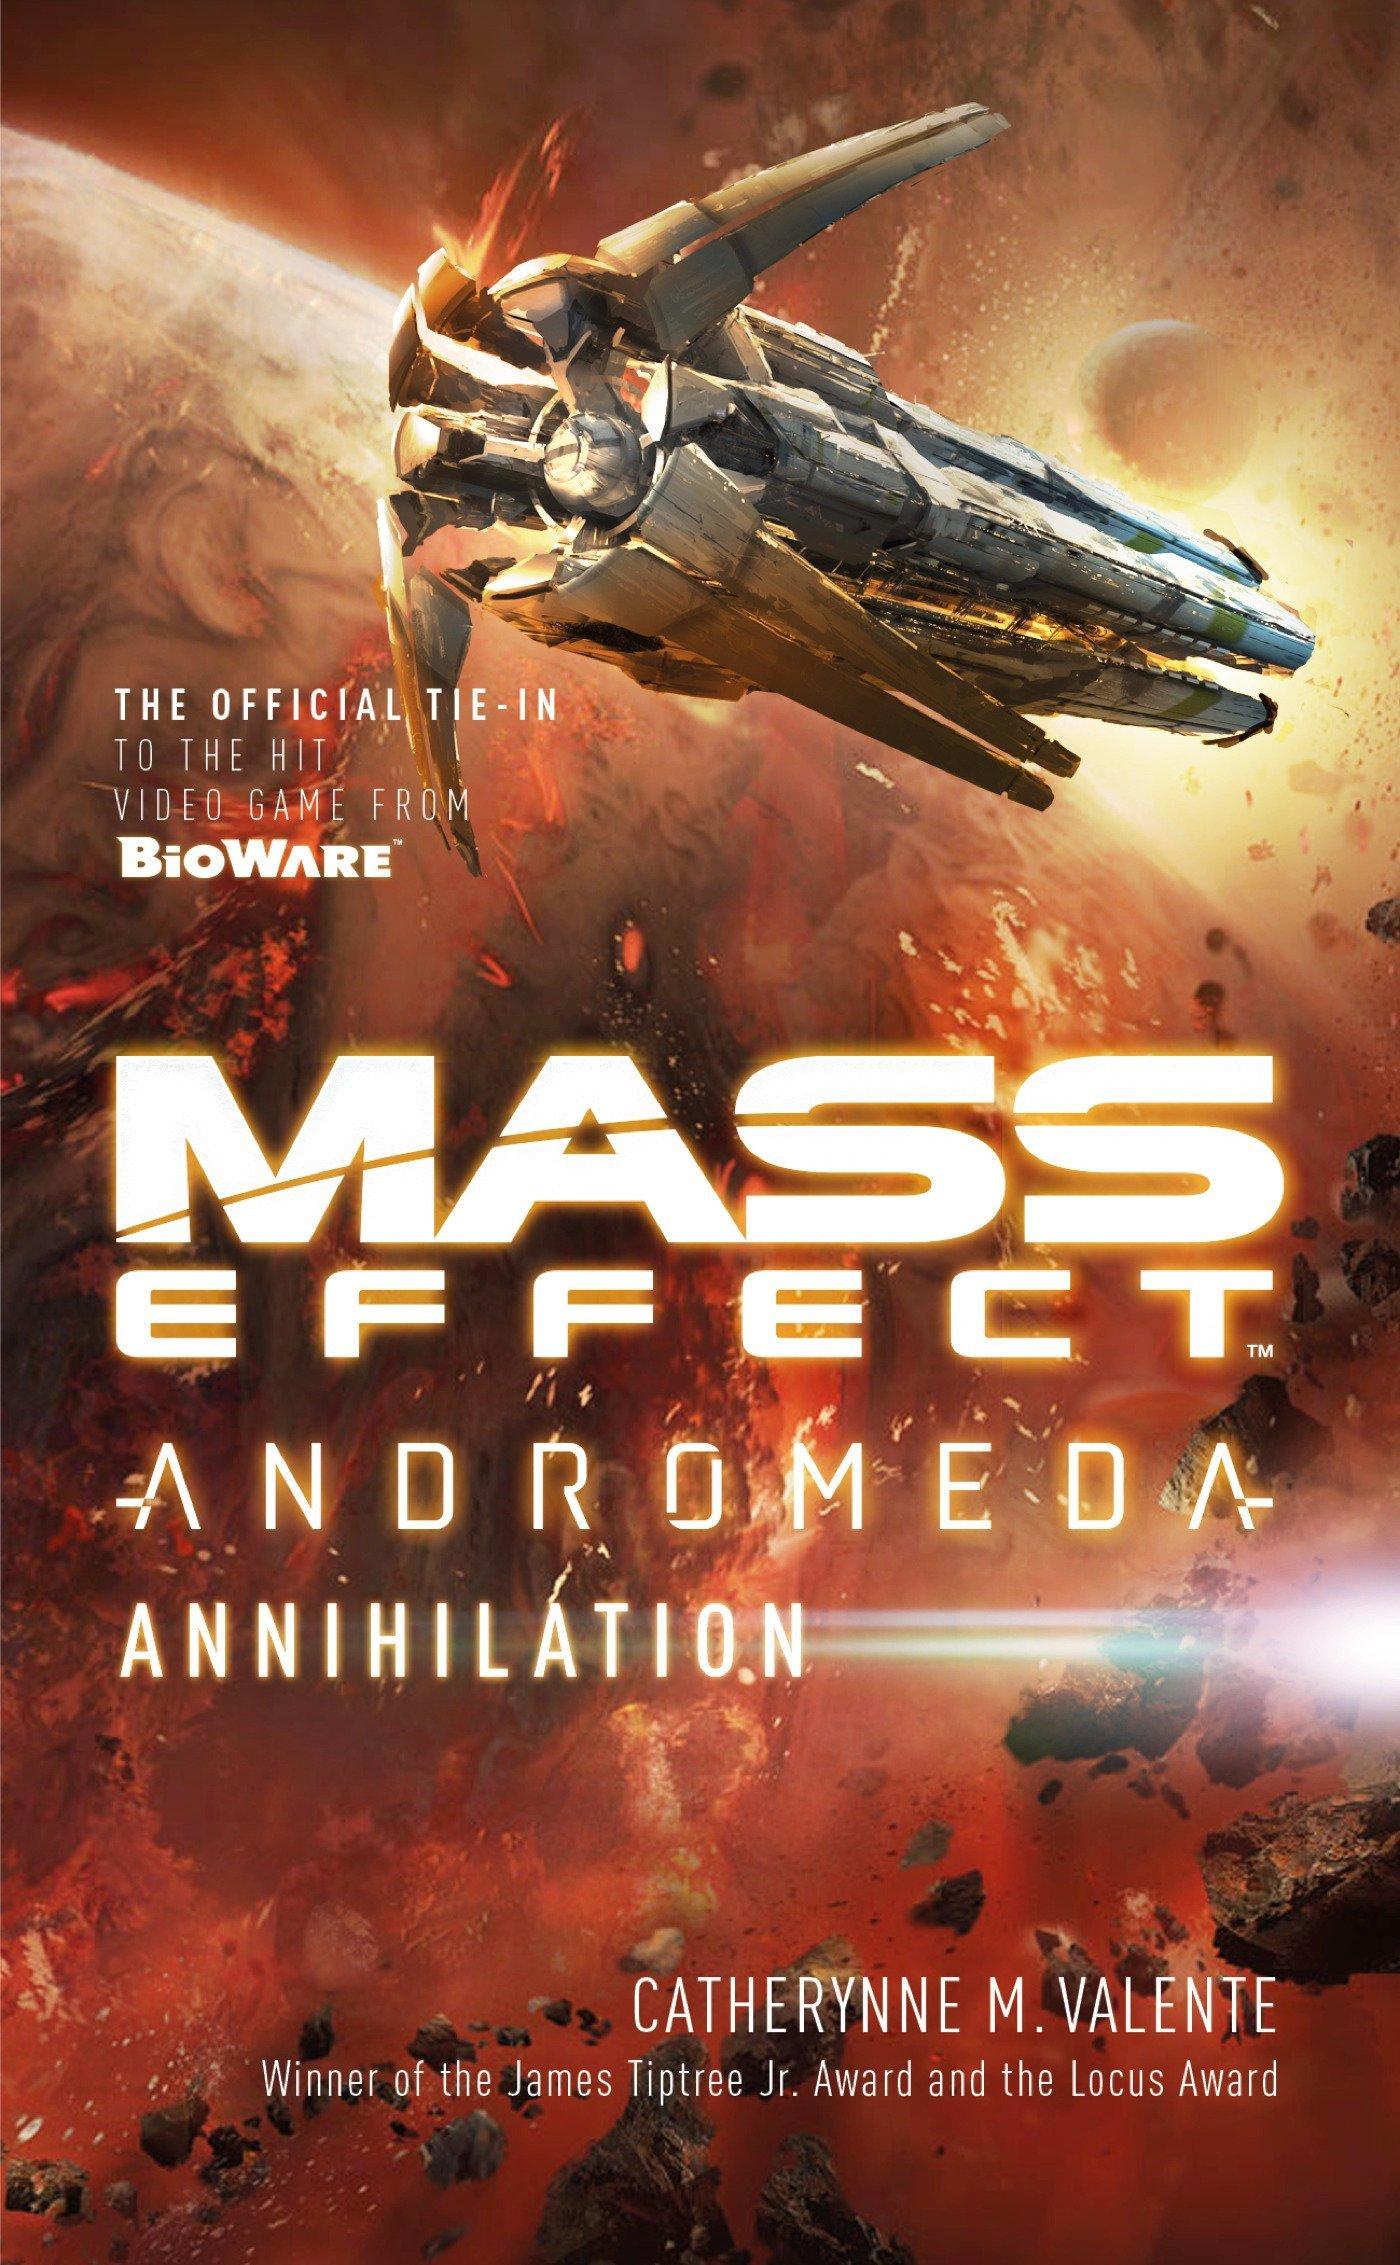 Mass Effect Andromeda - Annihilation